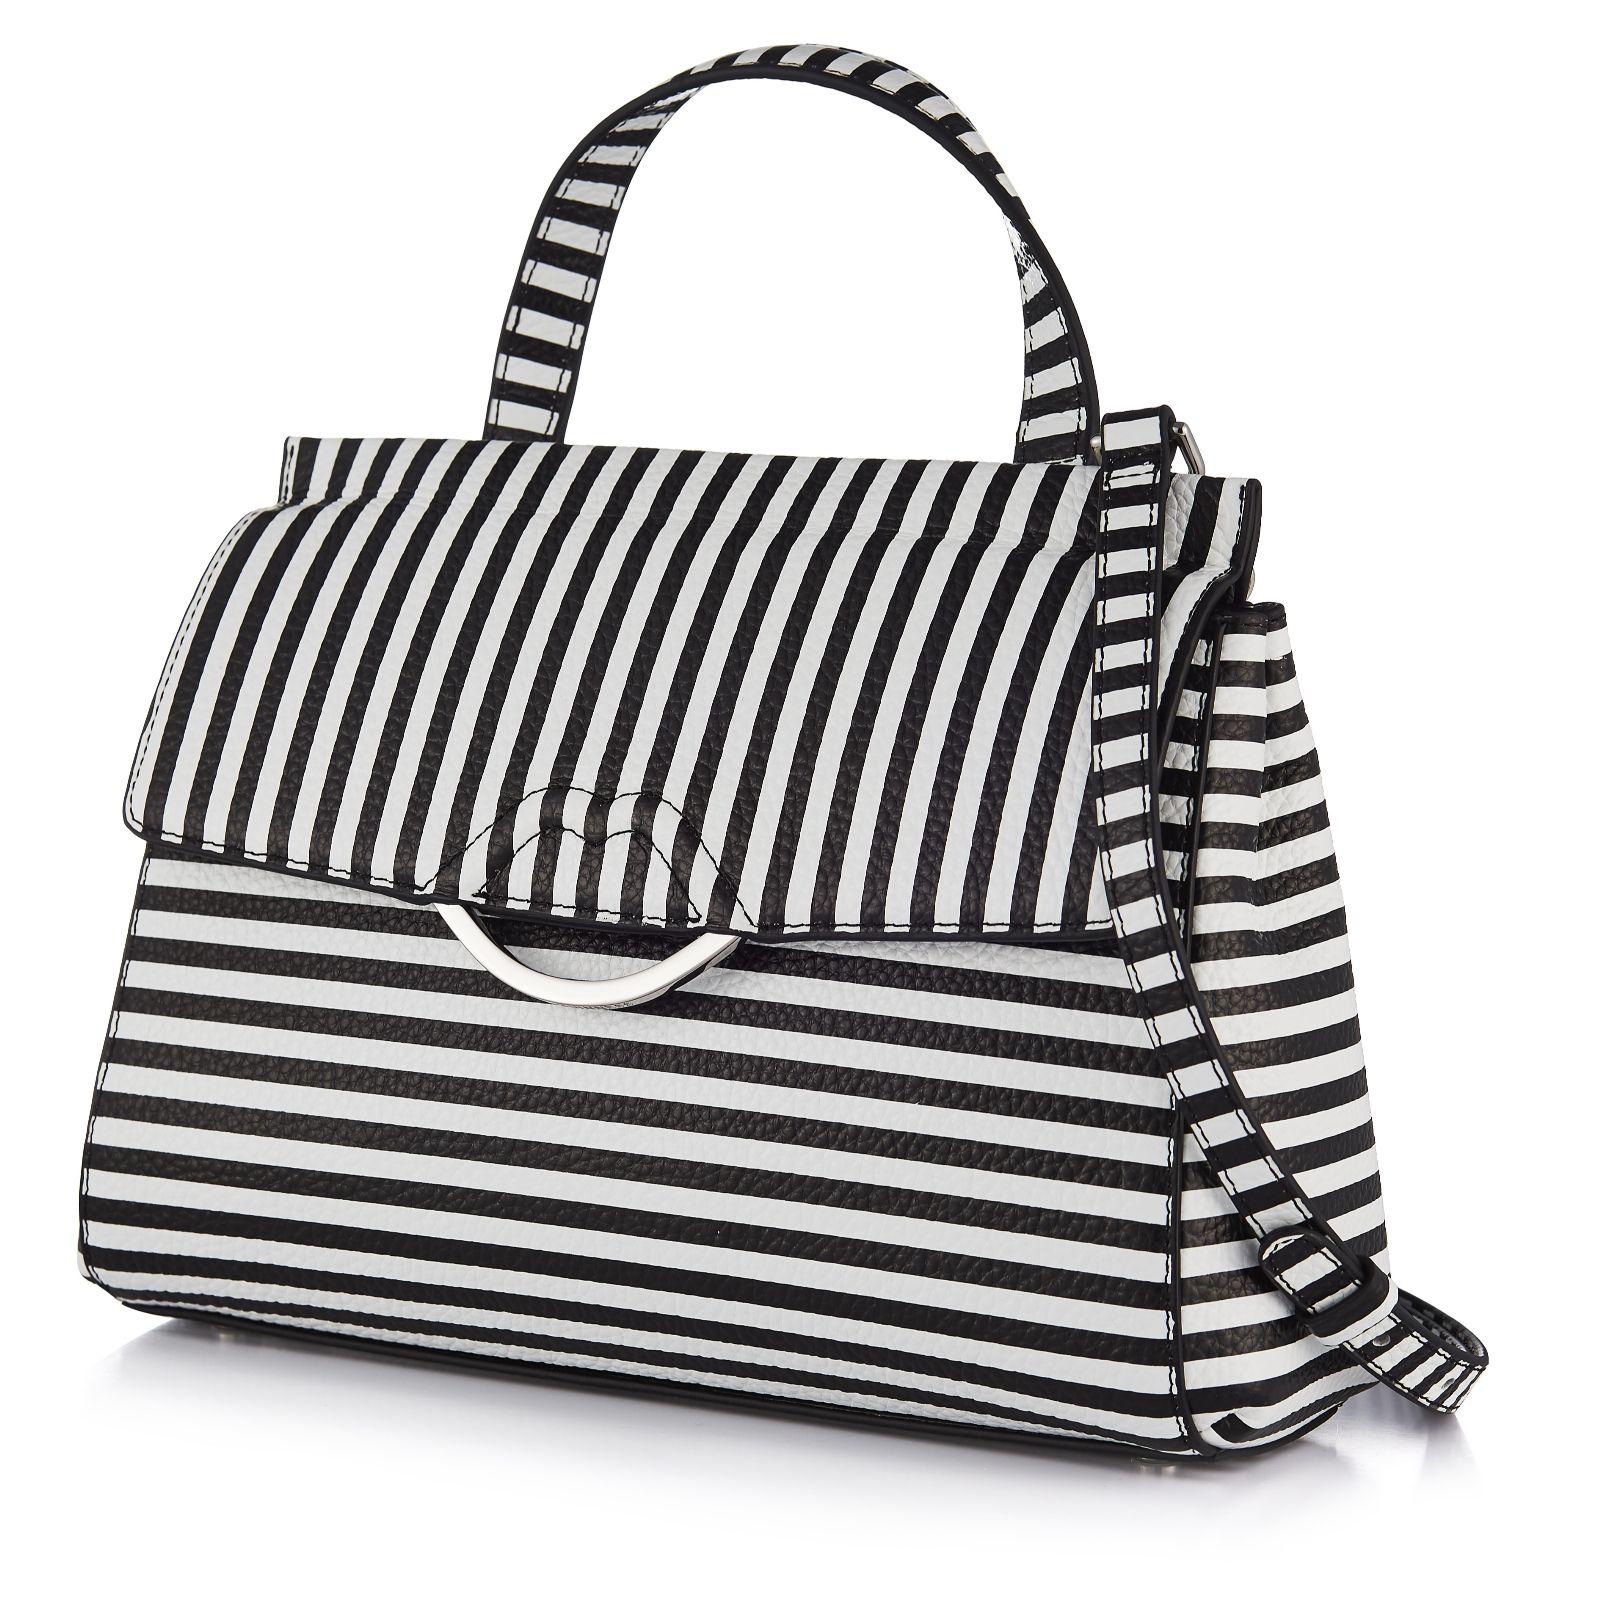 Lulu Guinness Gertie Medium Leather Bag with Crossbody Strap ... b25104a9fe895